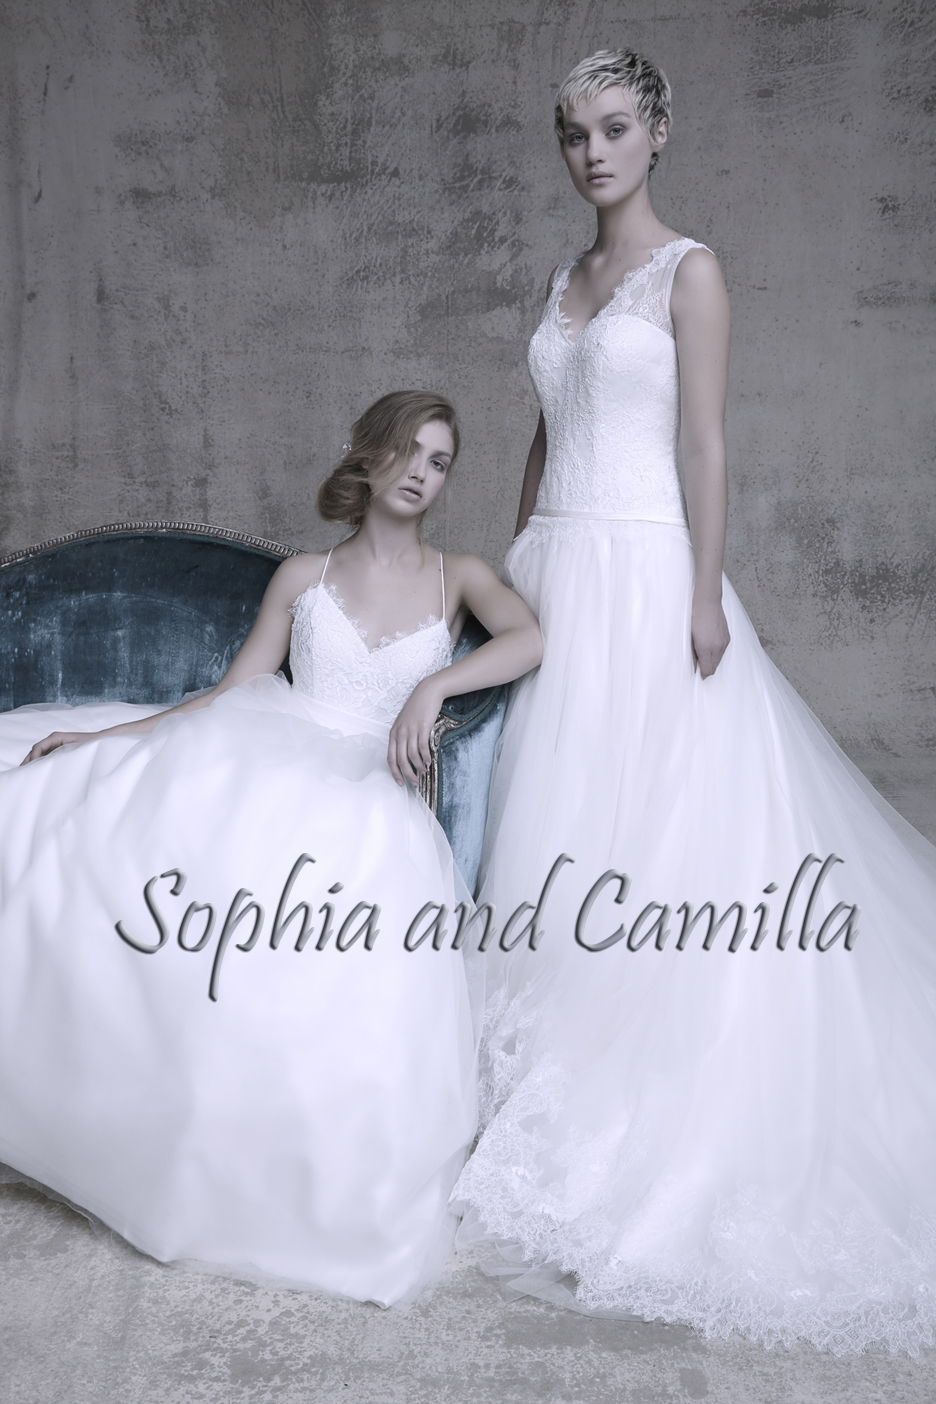 Sophia and Camilla_image_1.jpg